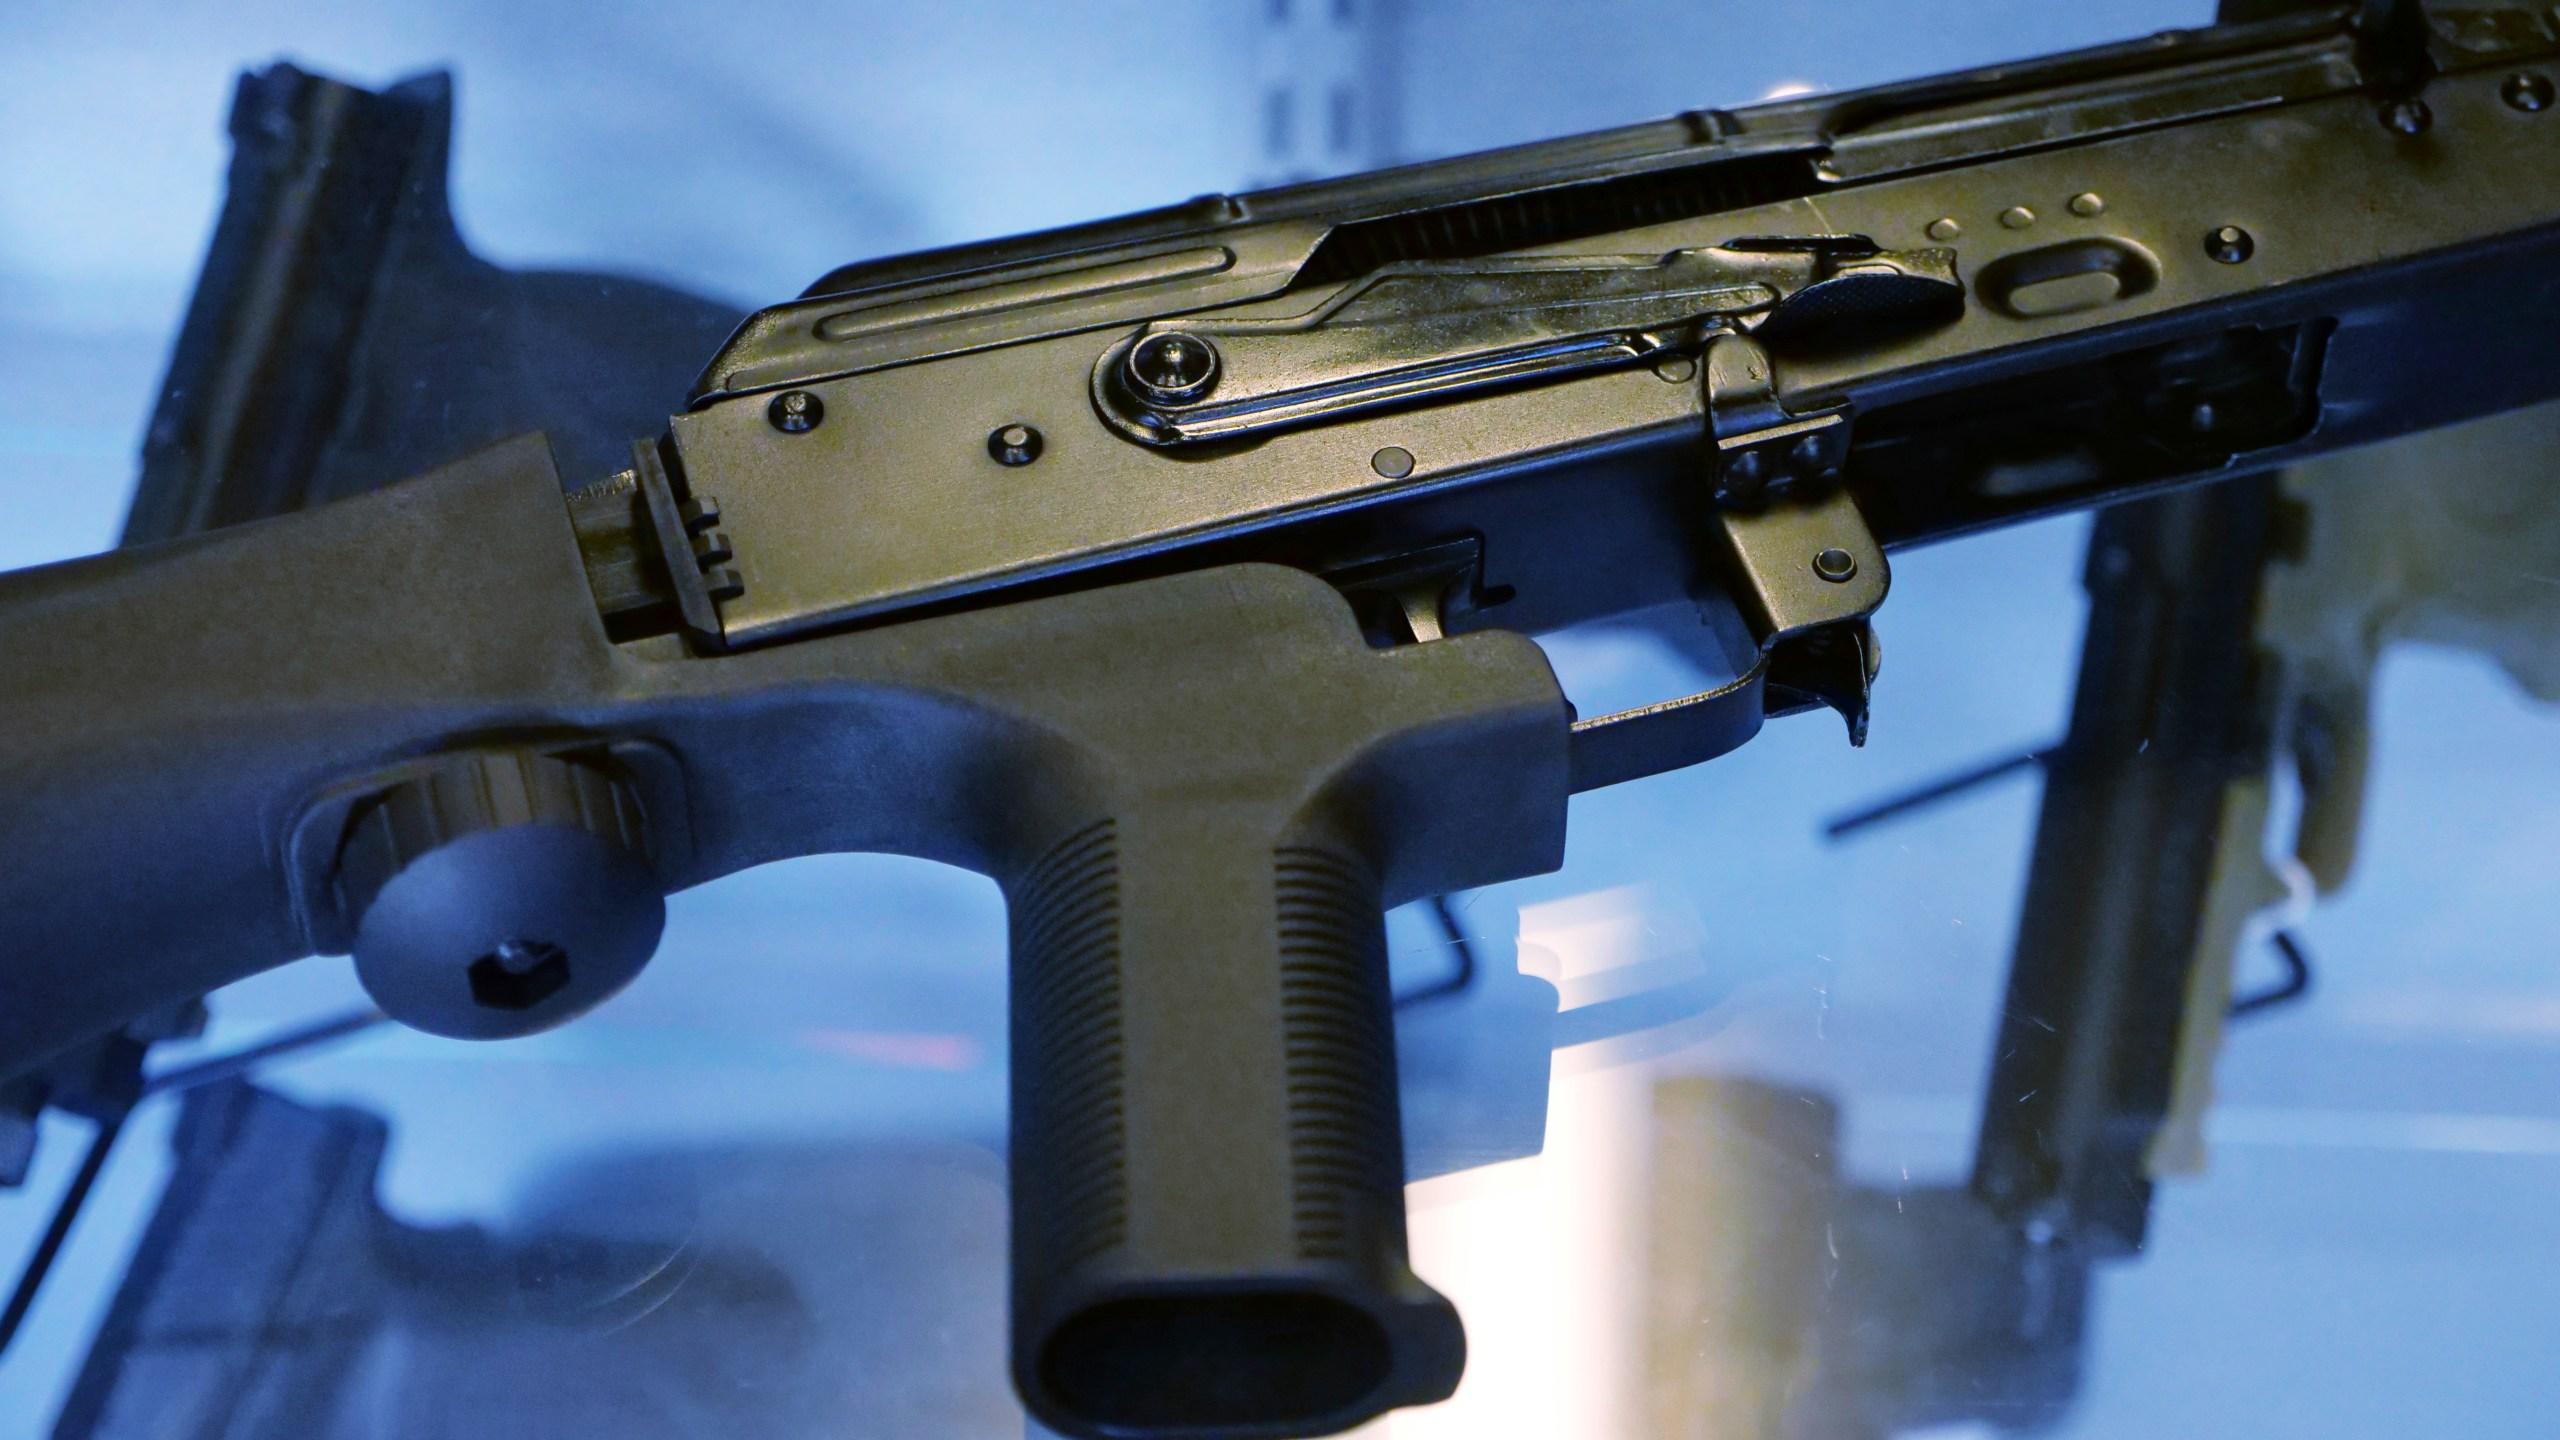 Guns_Bump_Stocks_95108-159532.jpg36093409